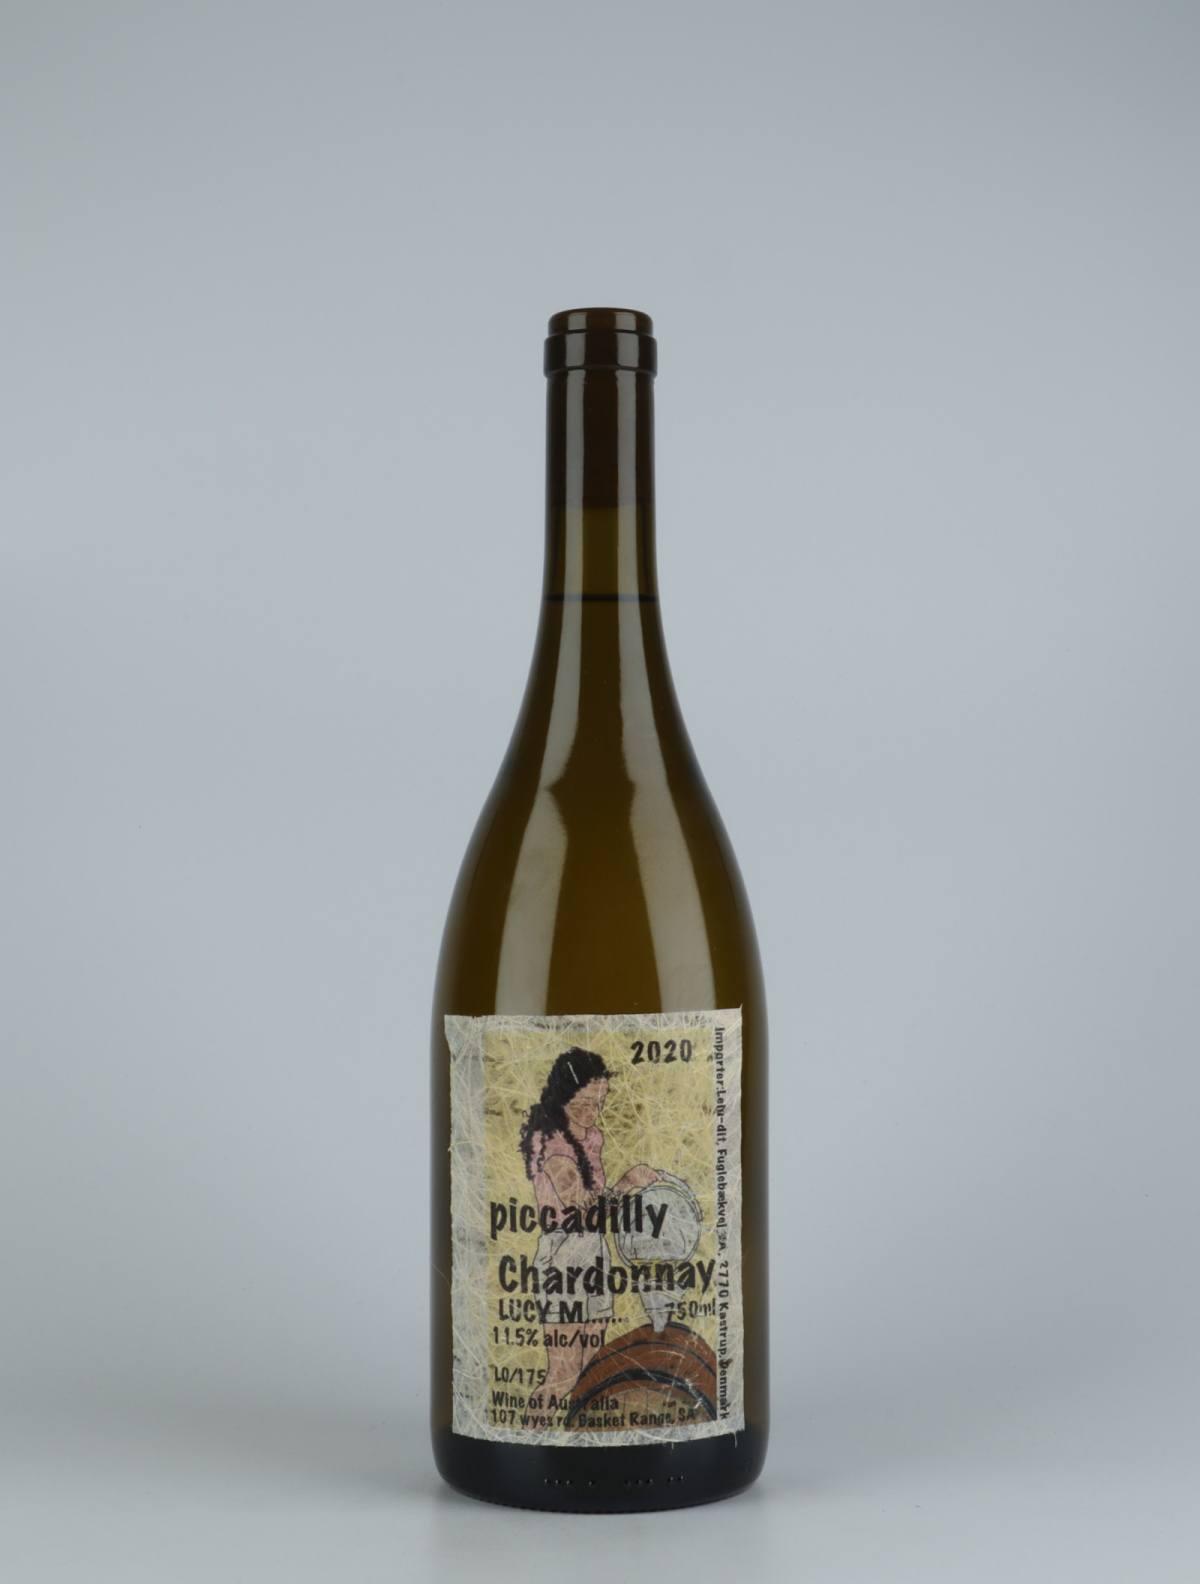 Picadilly Chardonnay